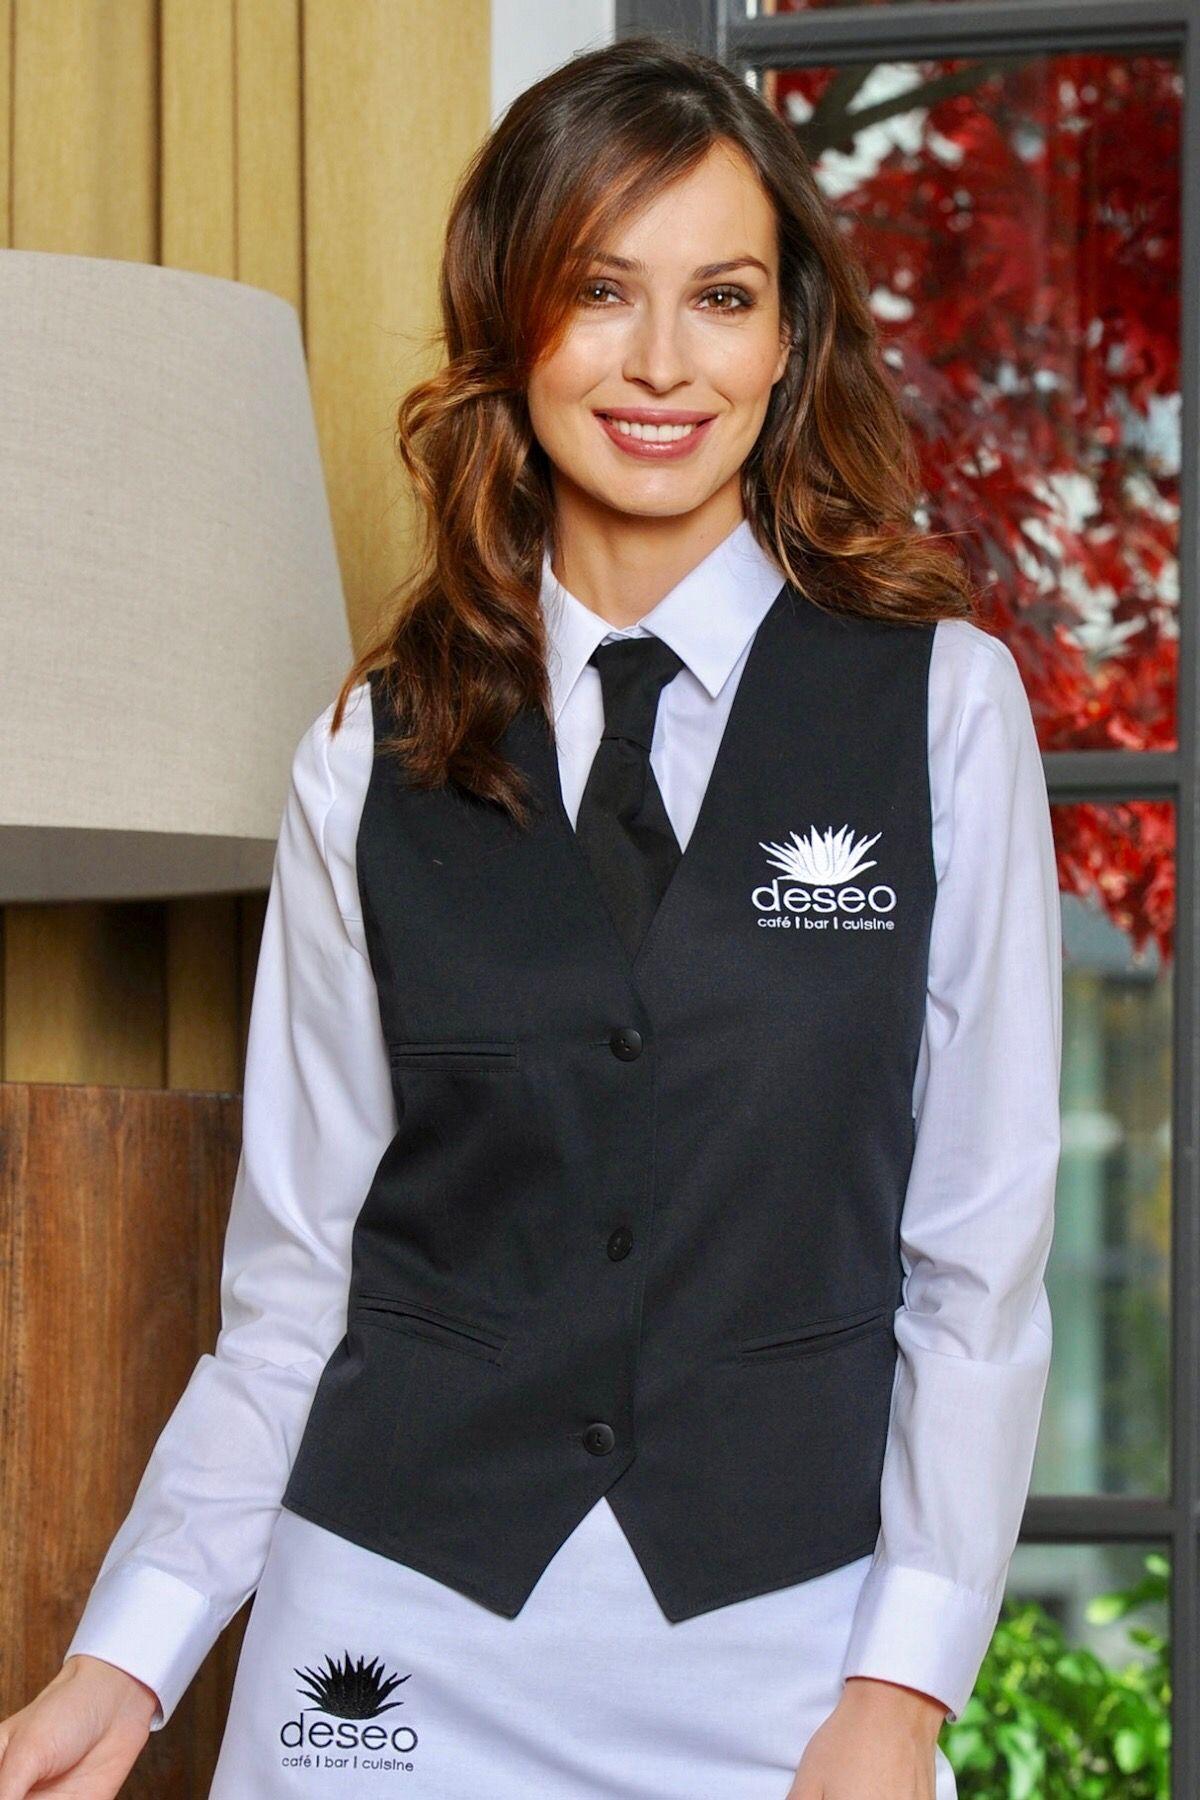 Pin By Idk On Shirts In 2019 Hotel Uniform Women Ties